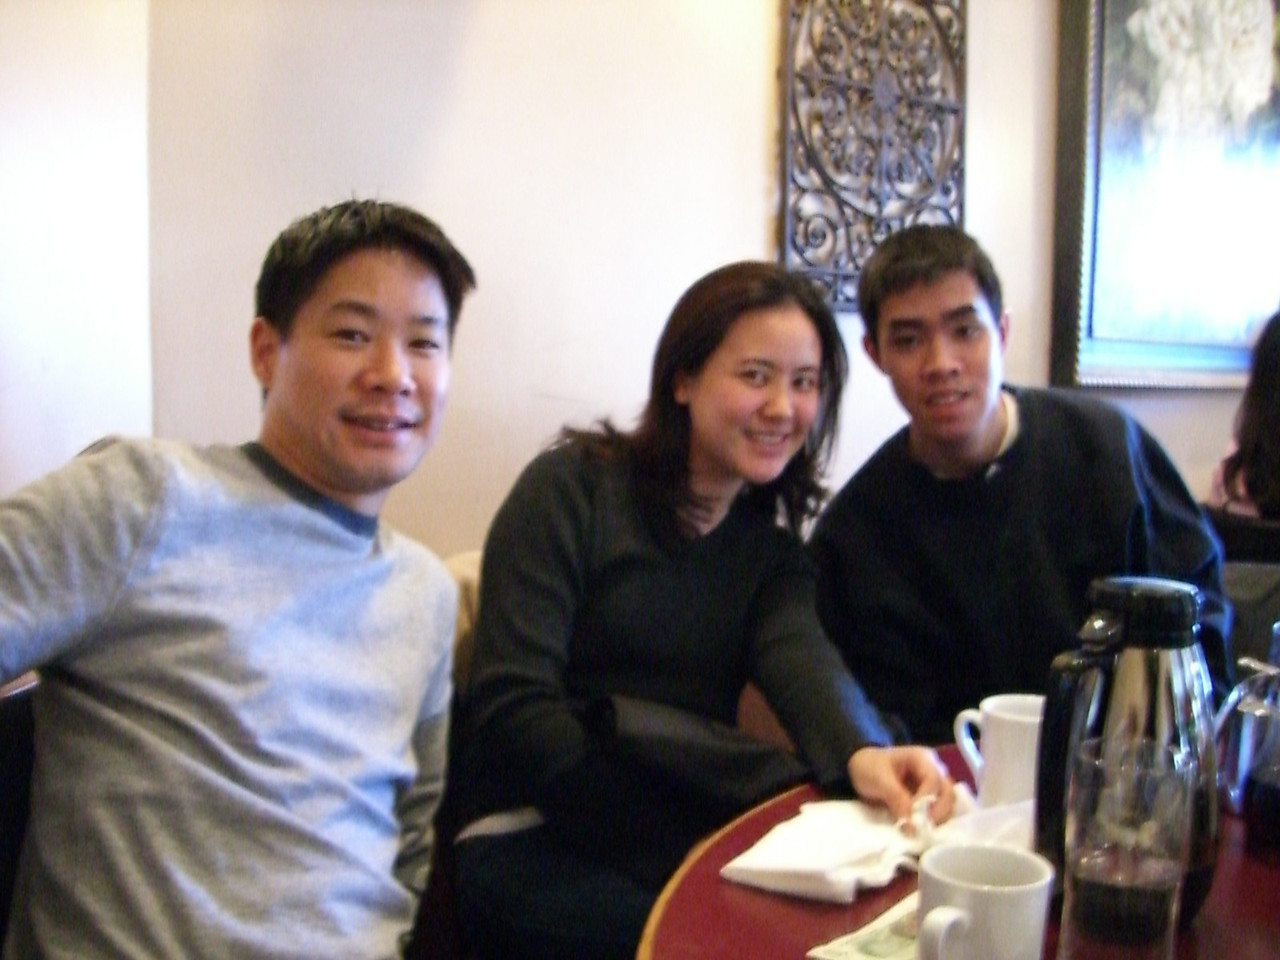 2006 03 25 Sat - Bernice Chen's Spring Break visit to NorCal - Joe Sun, Joanna Chi, & Joe's bro